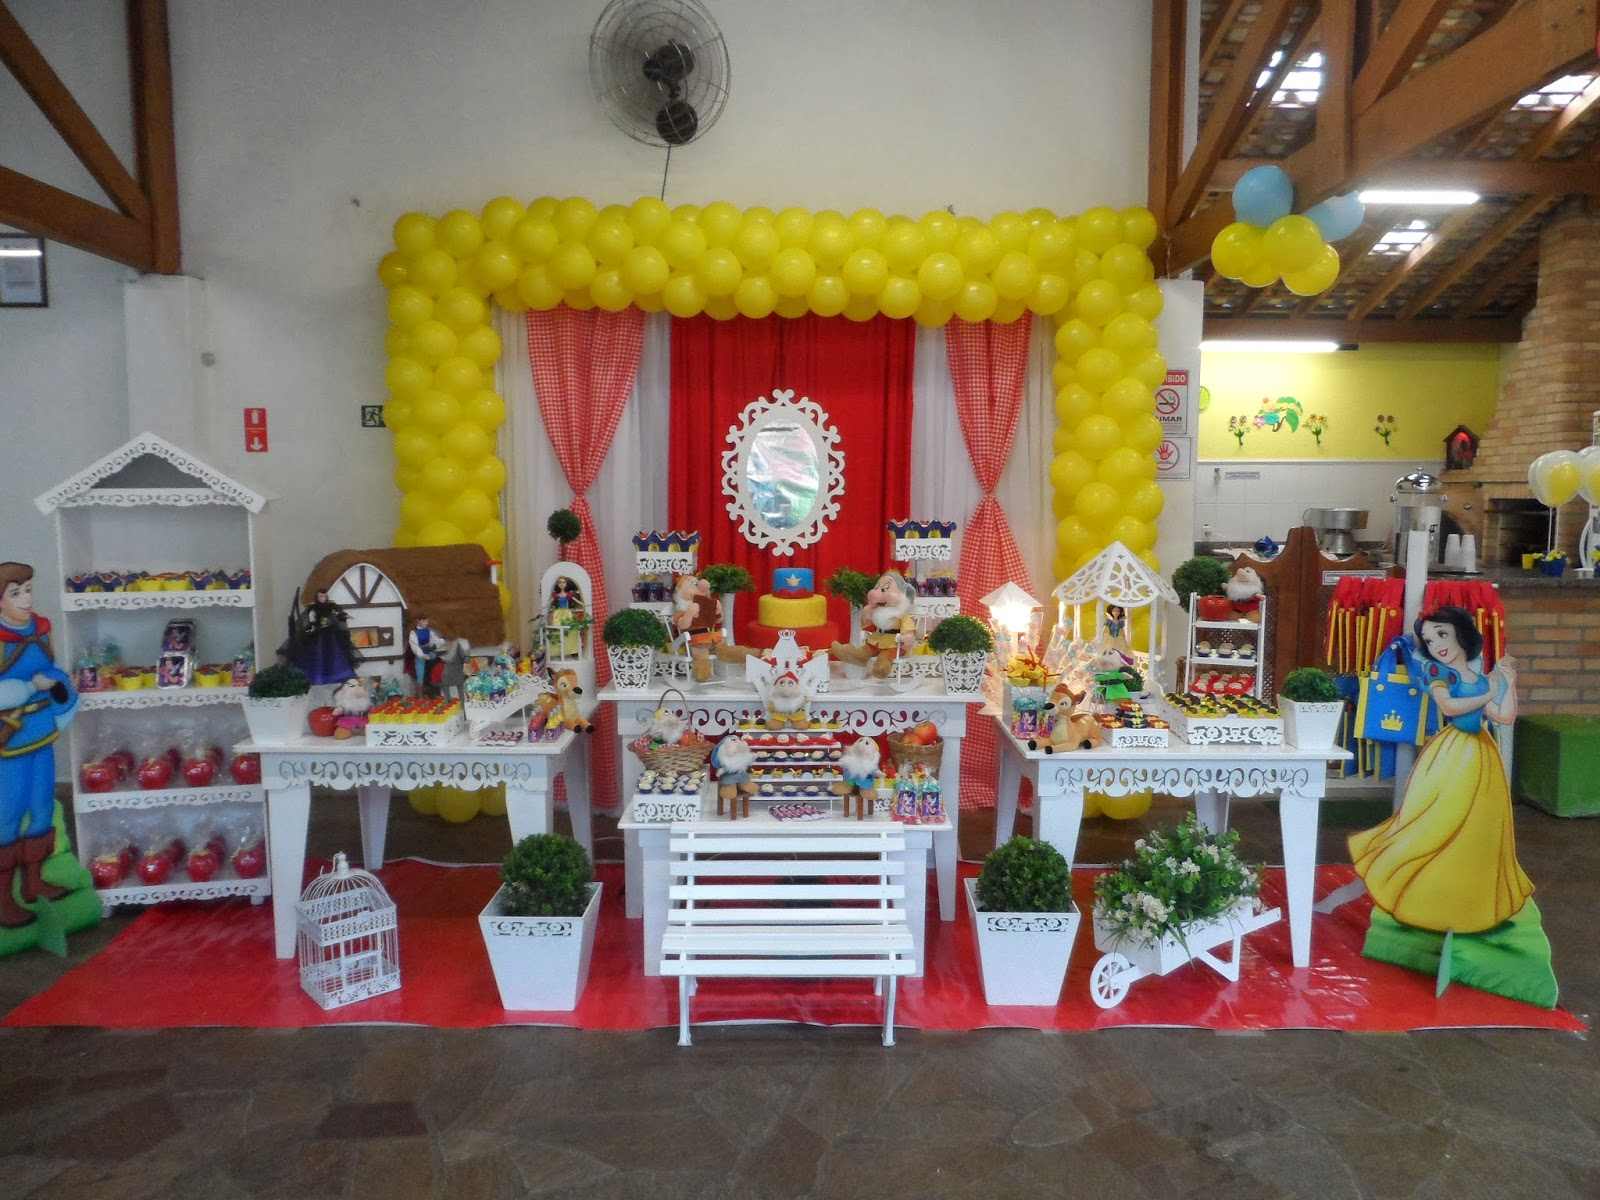 decoracao festa infantil branca de neve provencal : decoracao festa infantil branca de neve provencal:Crilê Decorações de Festas Infantis: BRANCA DE NEVE PROVENÇAL